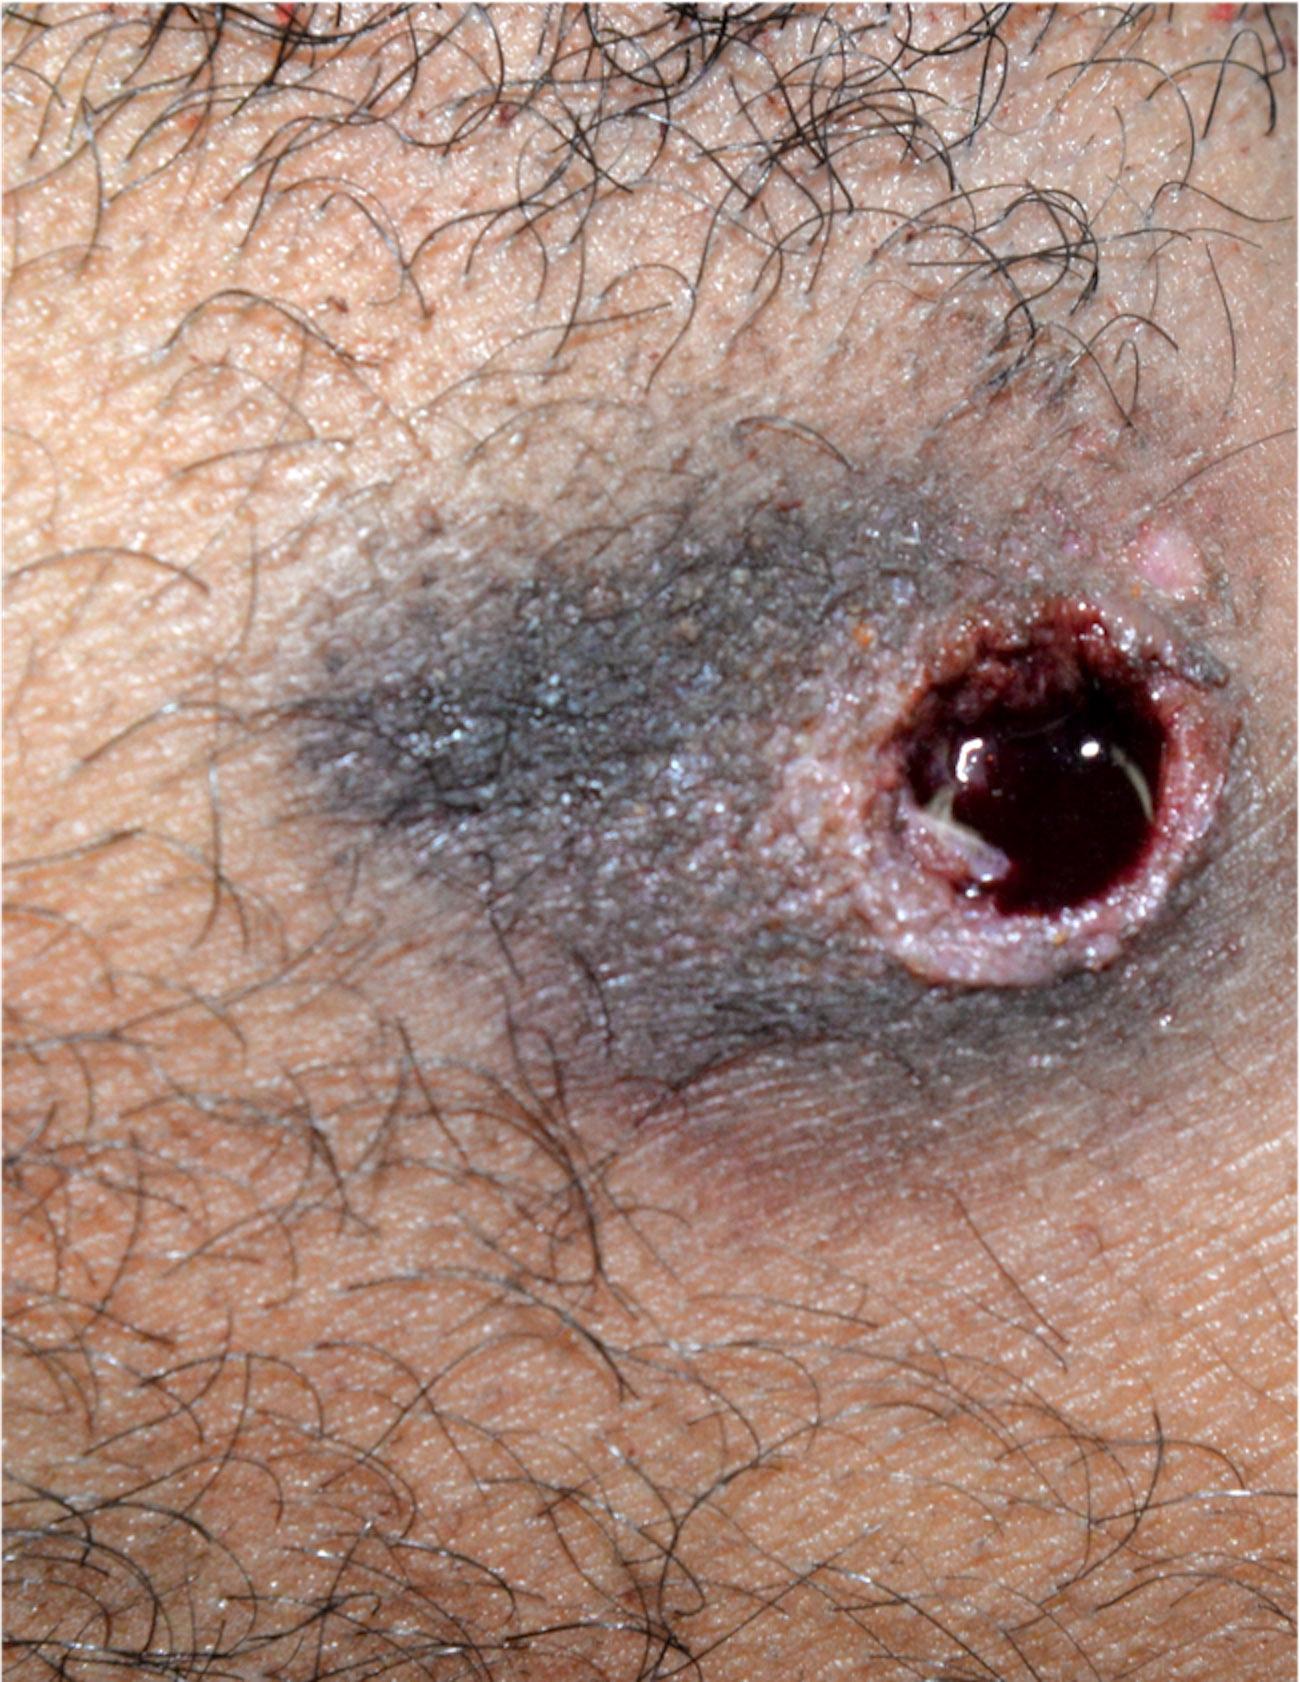 Loose contact entrance gunshot wound